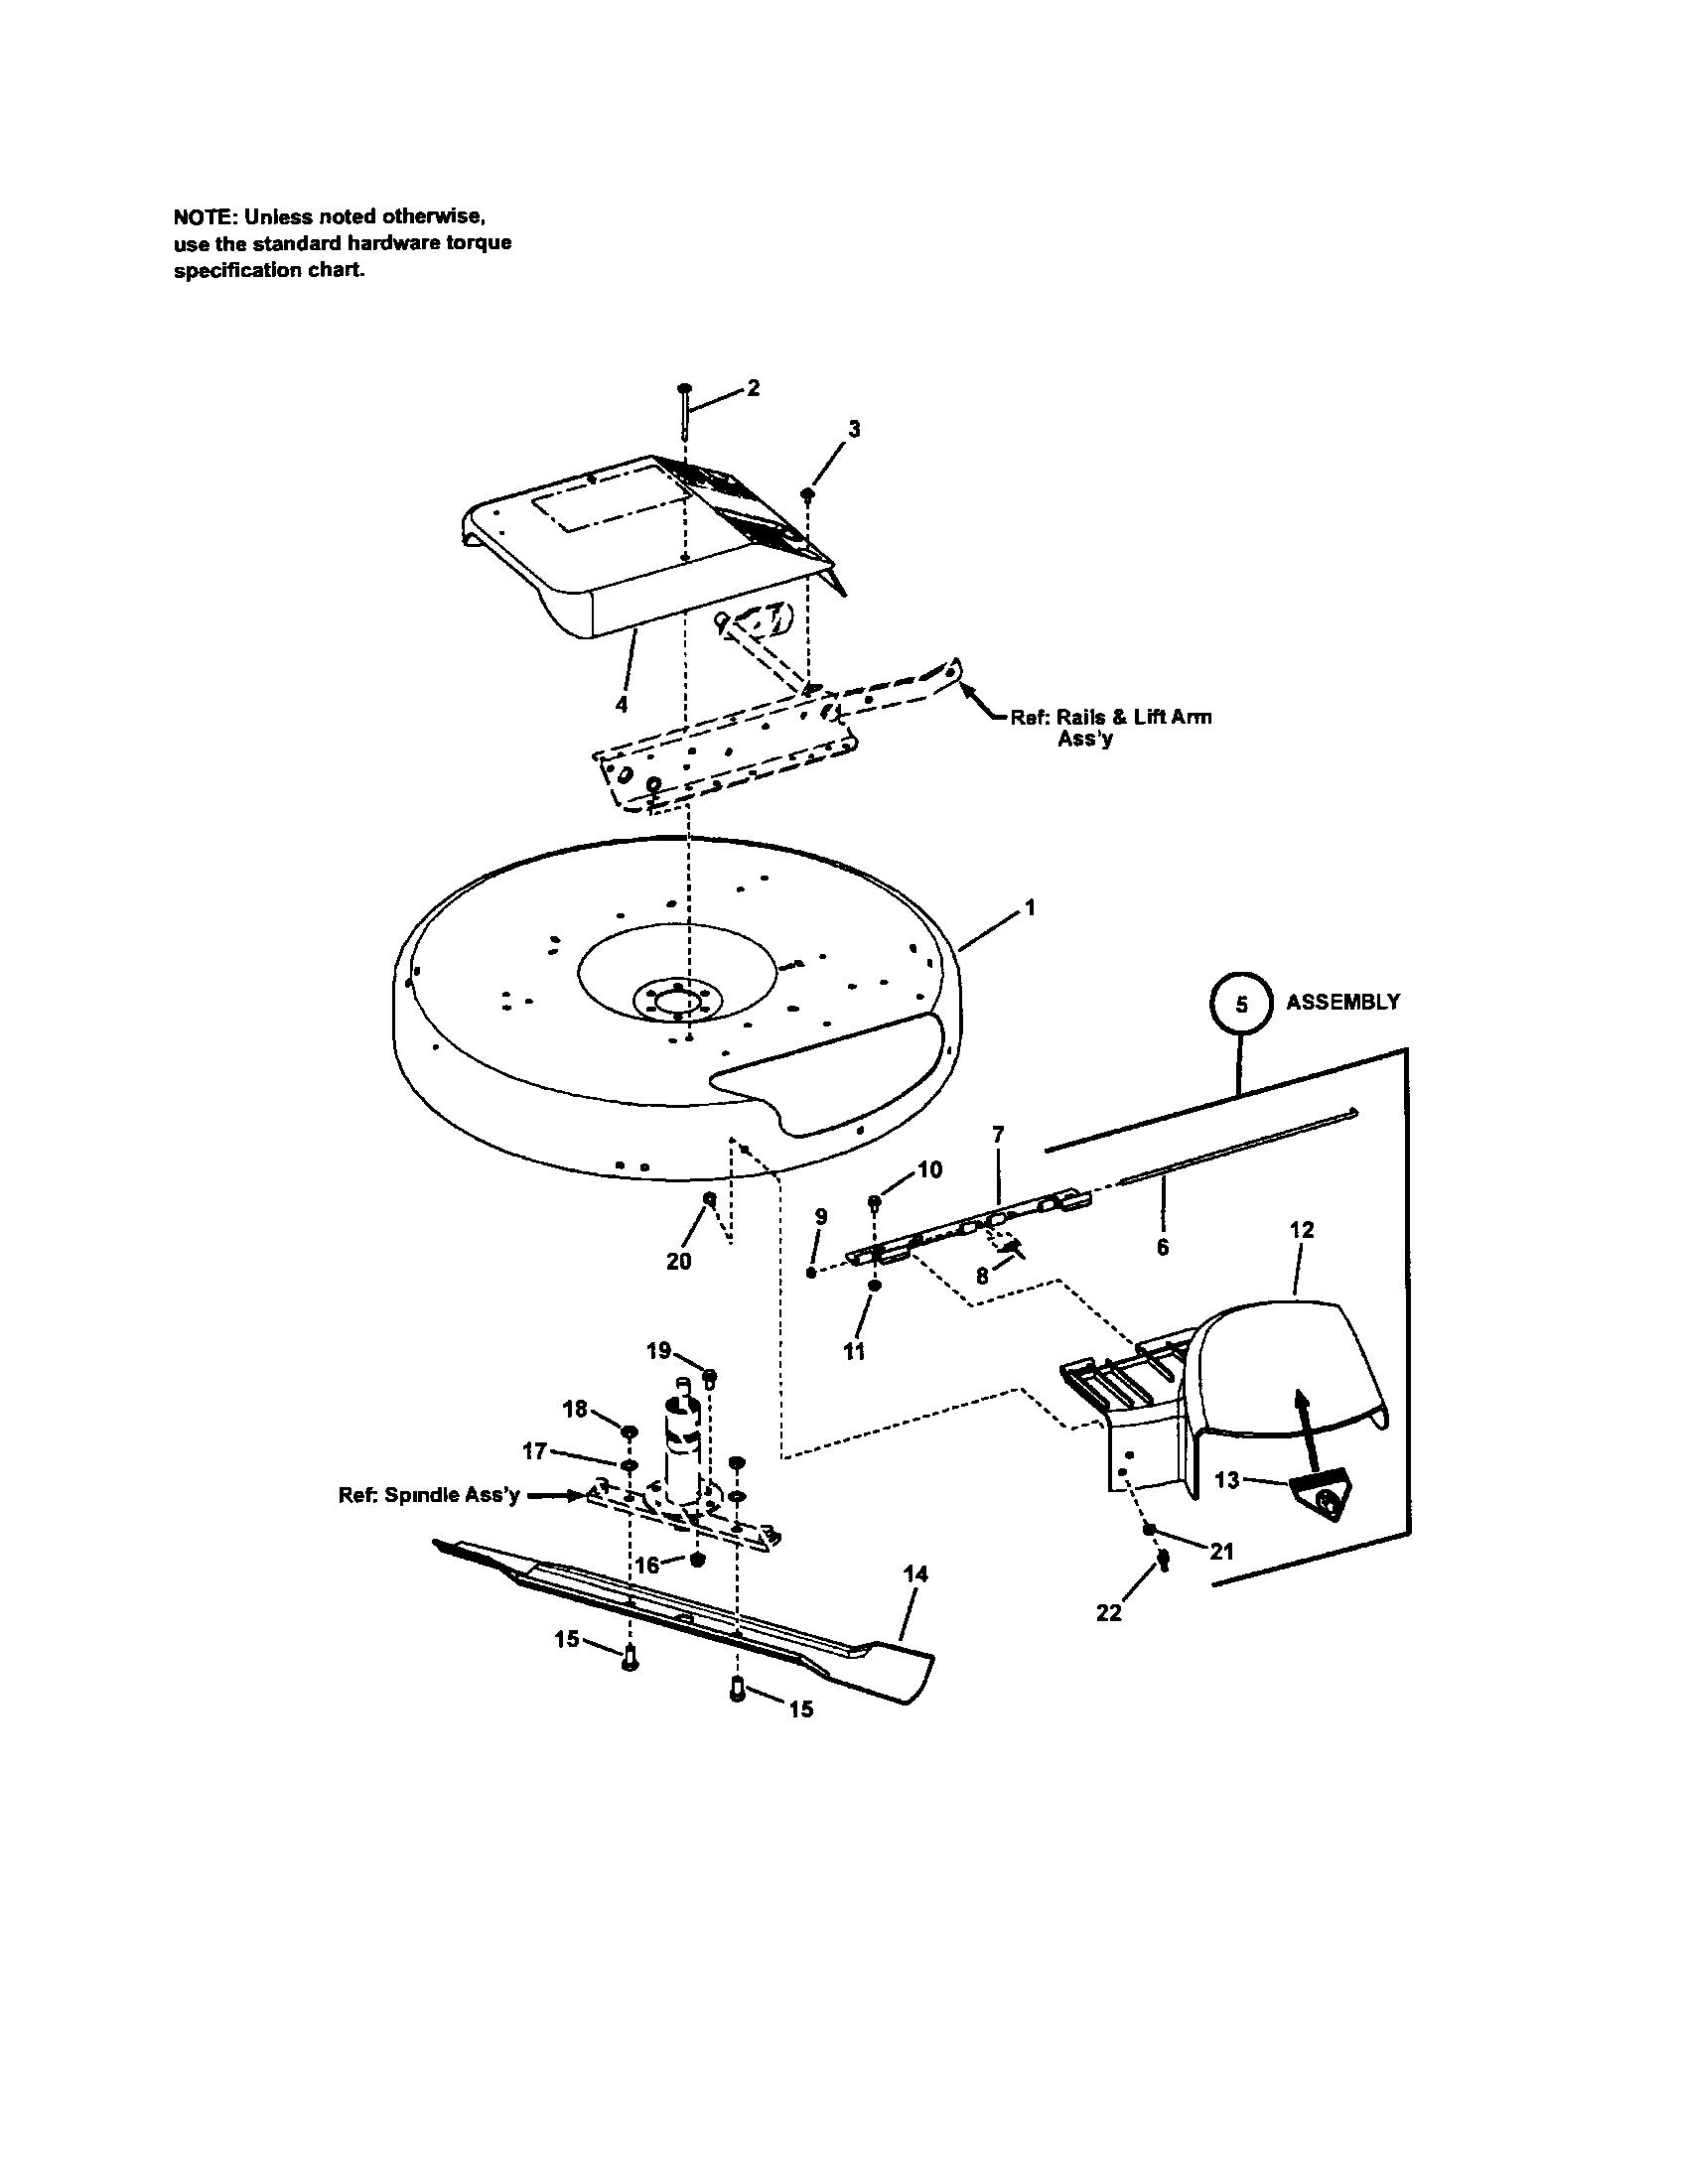 Craftsman model 107280340 lawn, riding mower rear engine